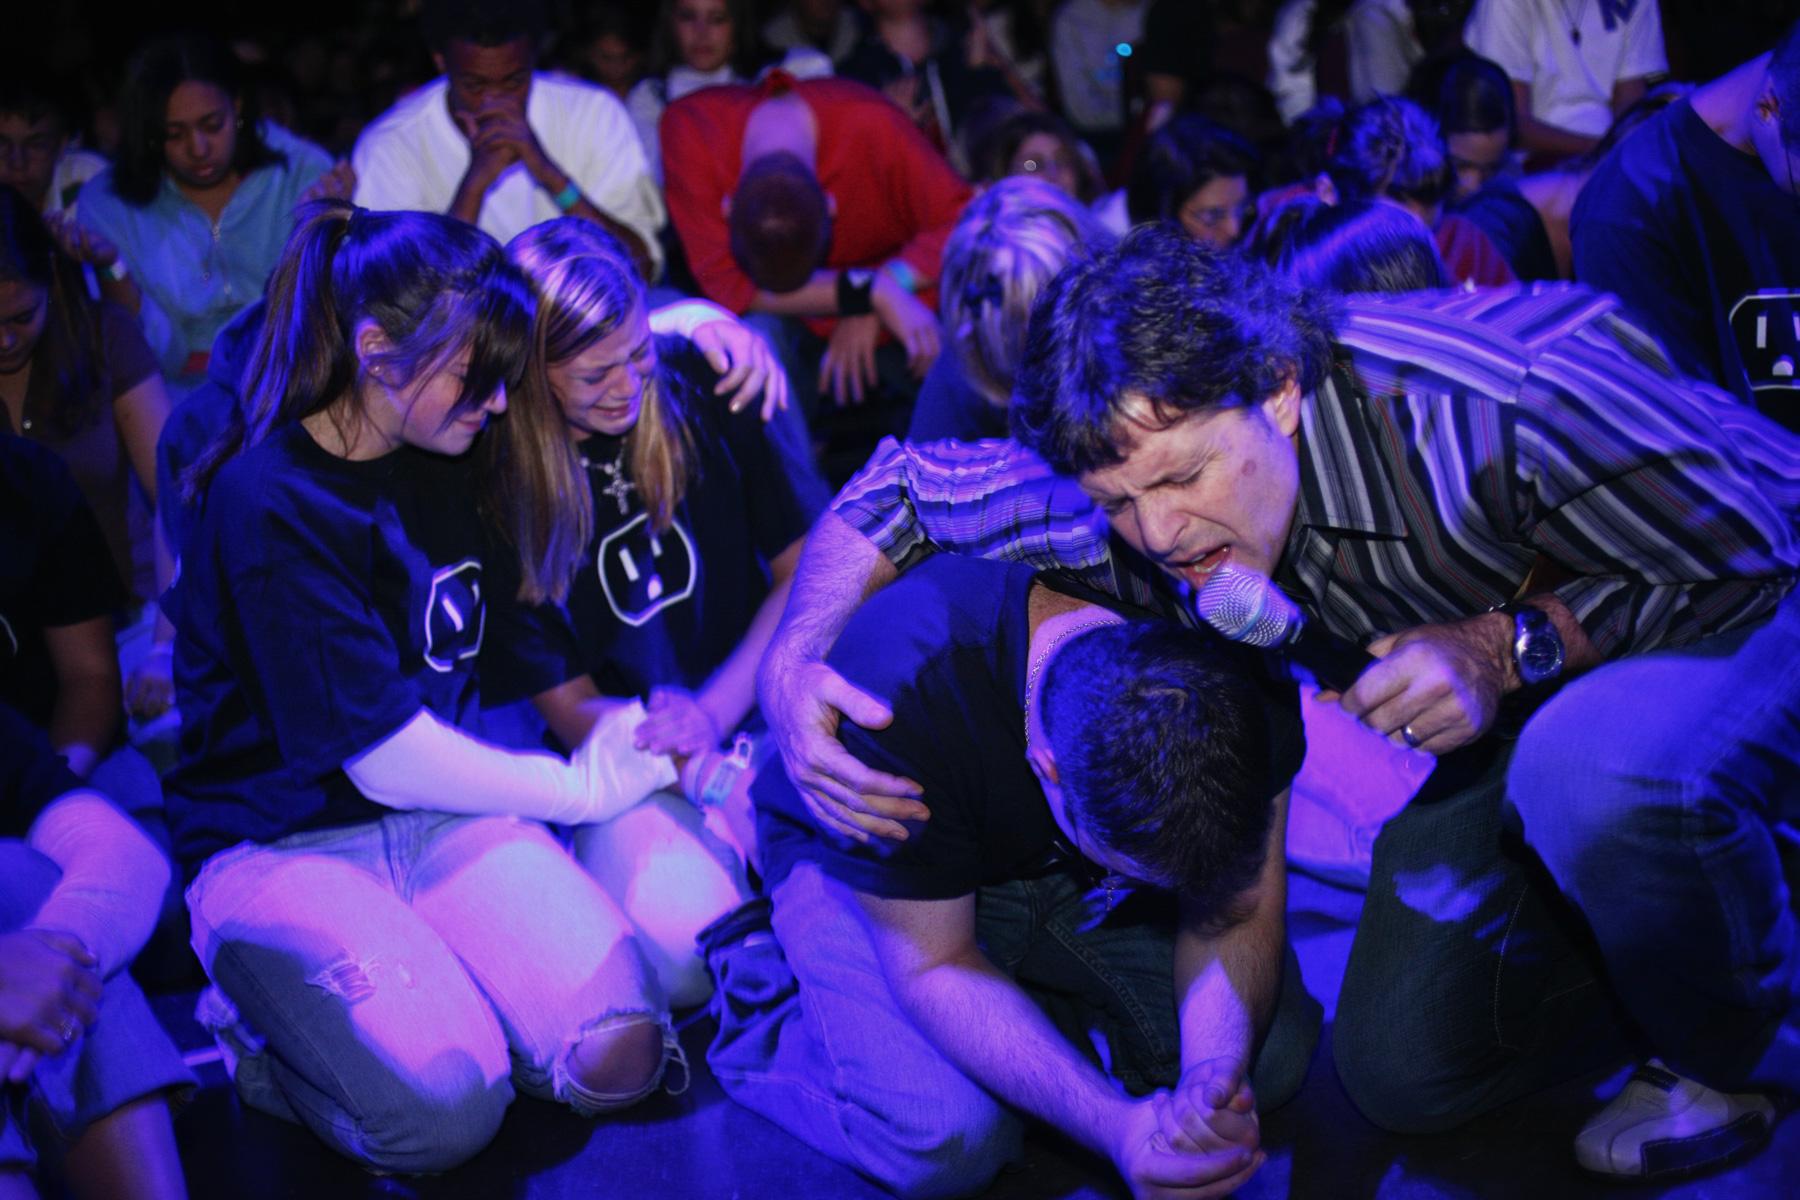 youth-christian-evangelical-1.jpg